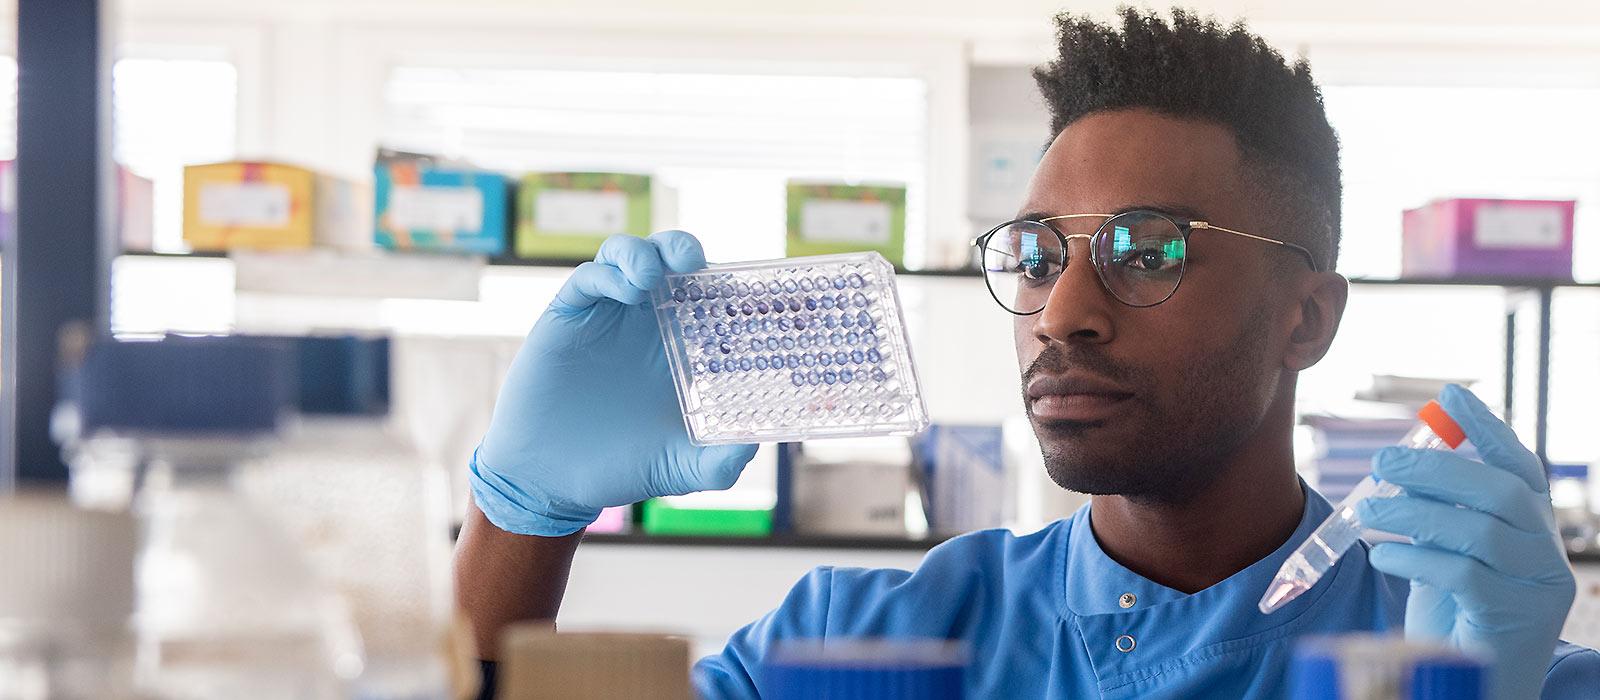 A COVID-19 vaccine researcher using scientific equipment in an Oxford University laboratory